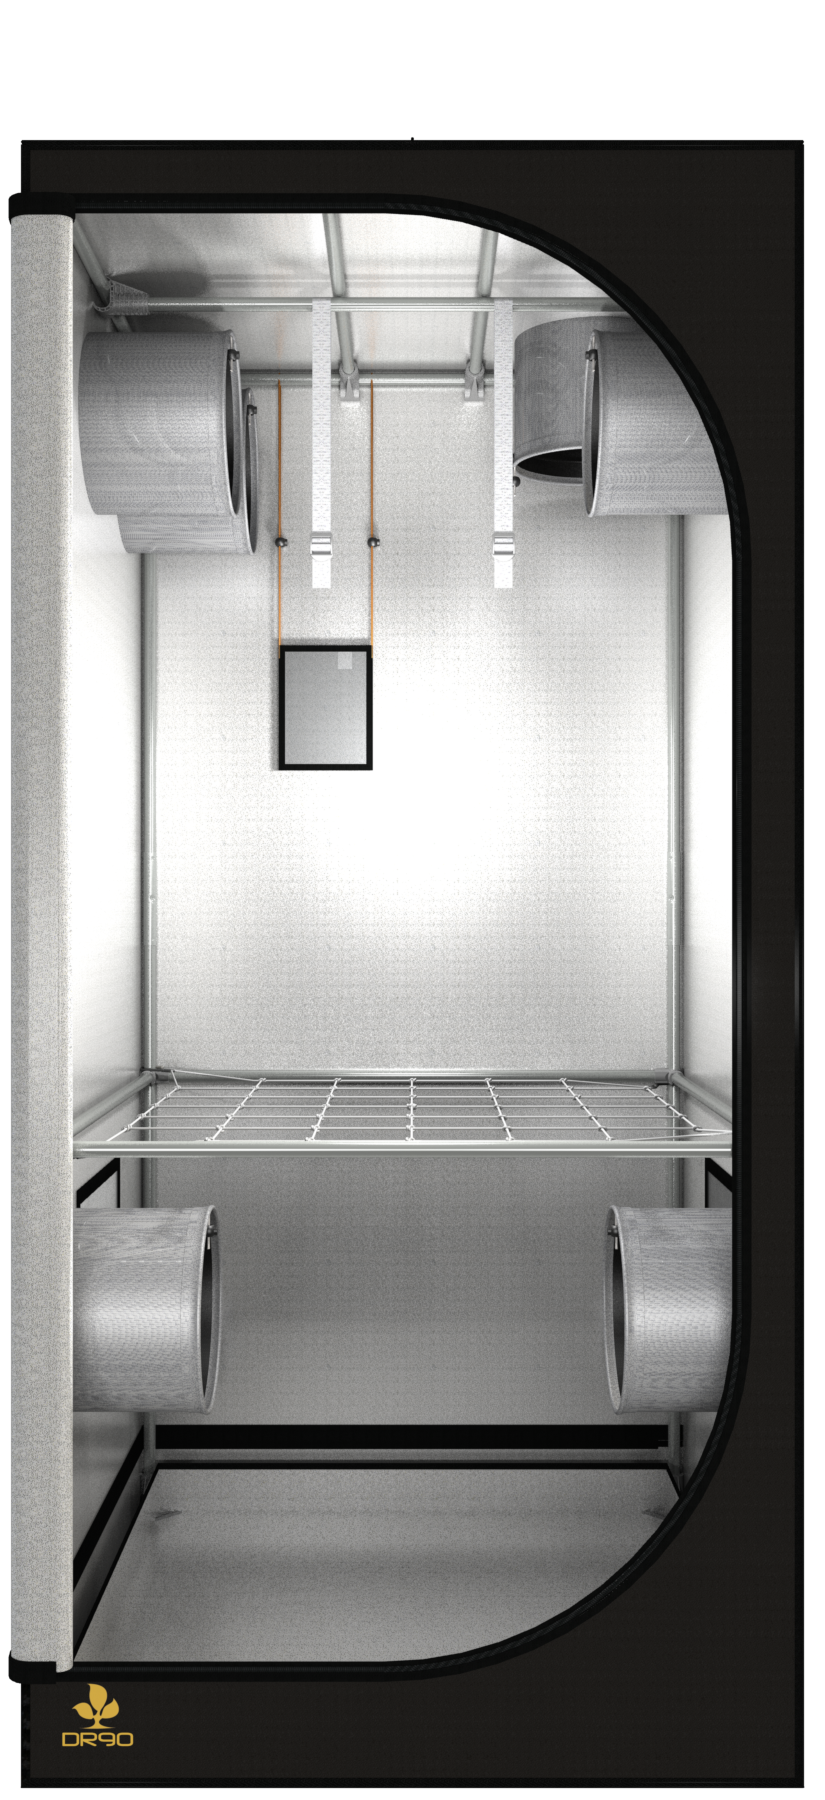 secret jardin kaufen growbox growshop online healthy. Black Bedroom Furniture Sets. Home Design Ideas